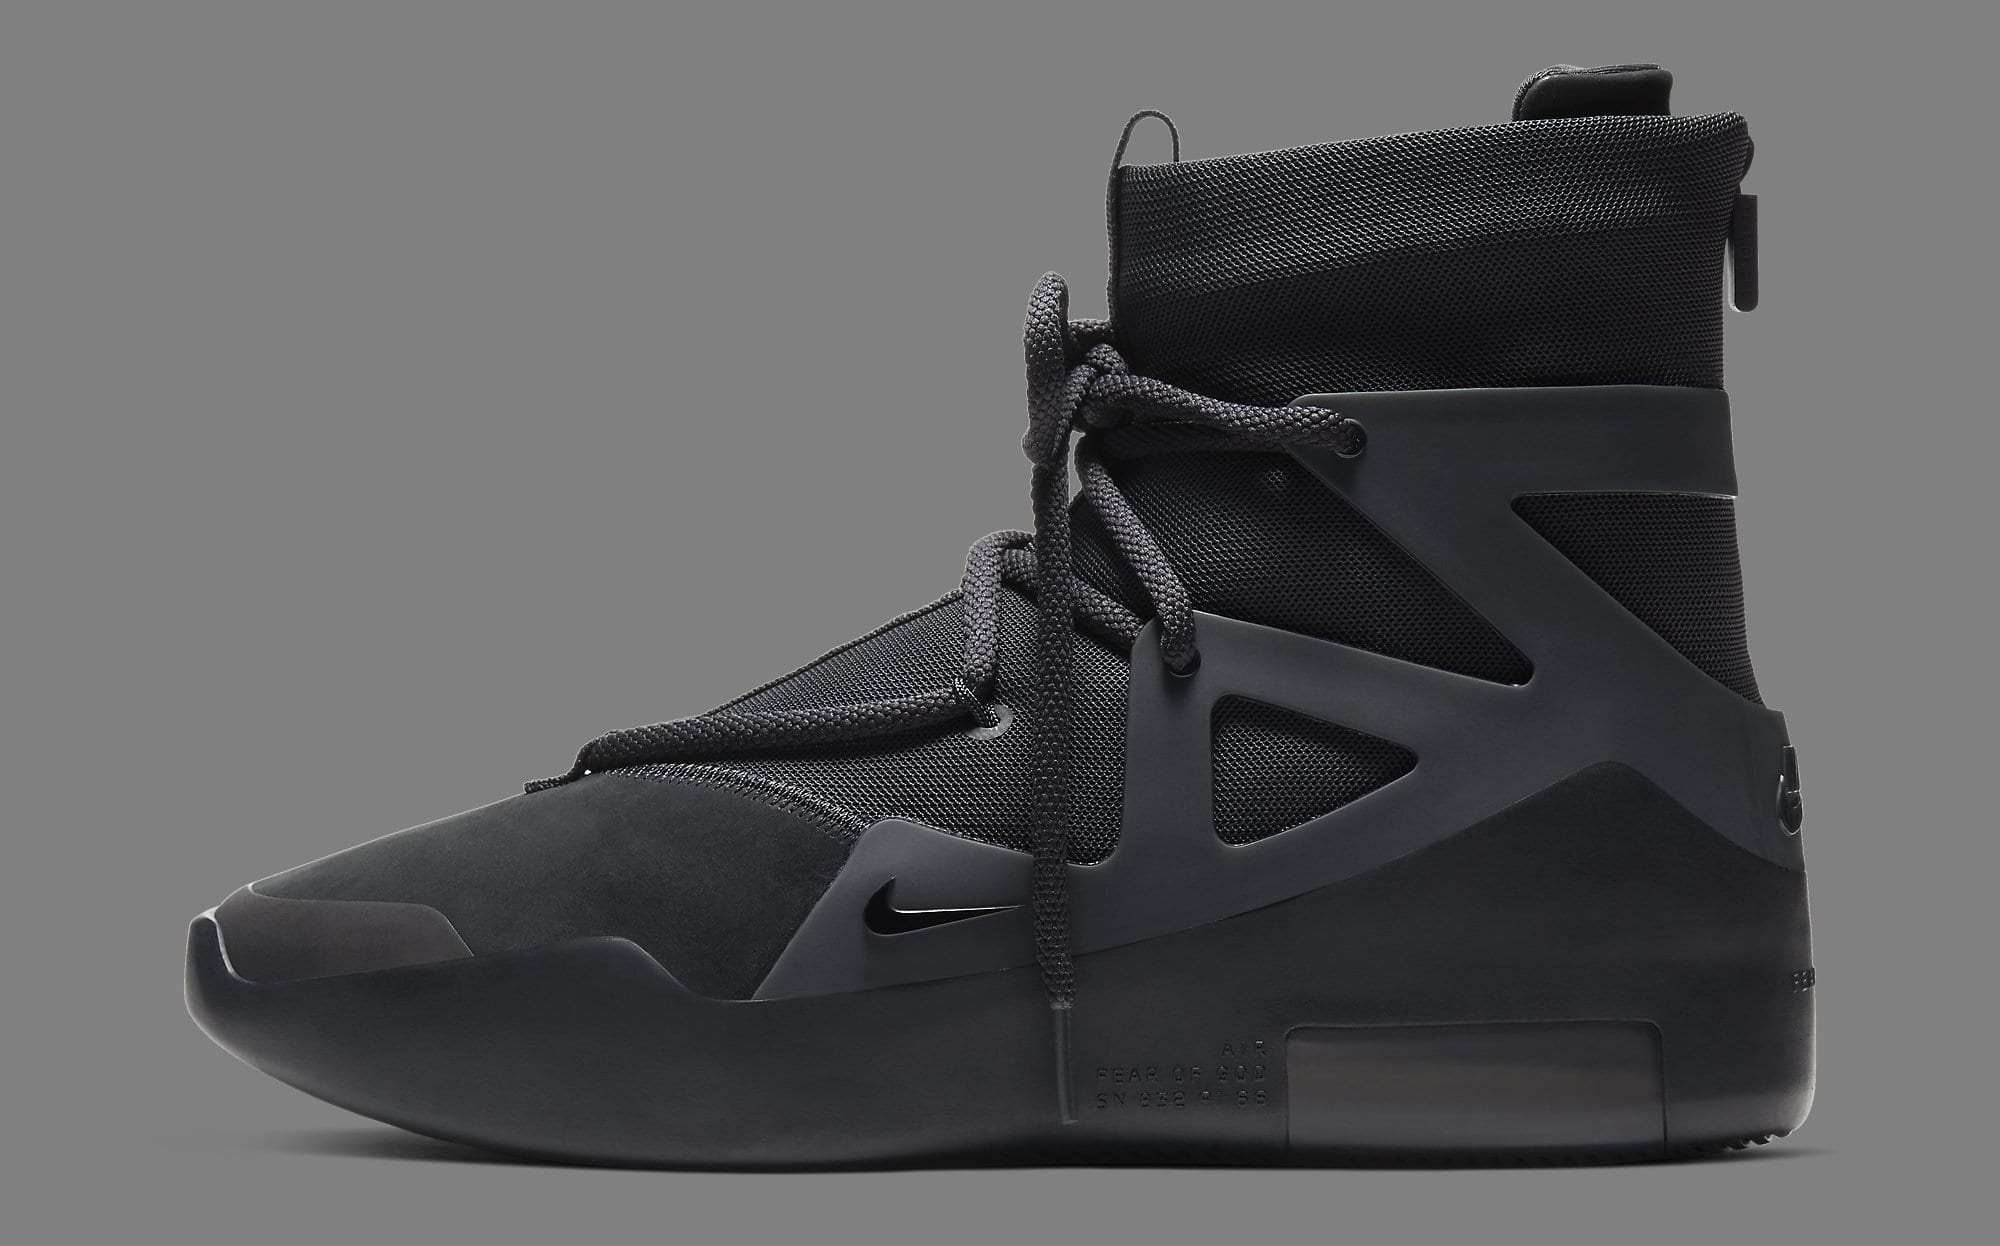 Nike Air Fear of God 1 'Triple Black' AR4237-005 Lateral